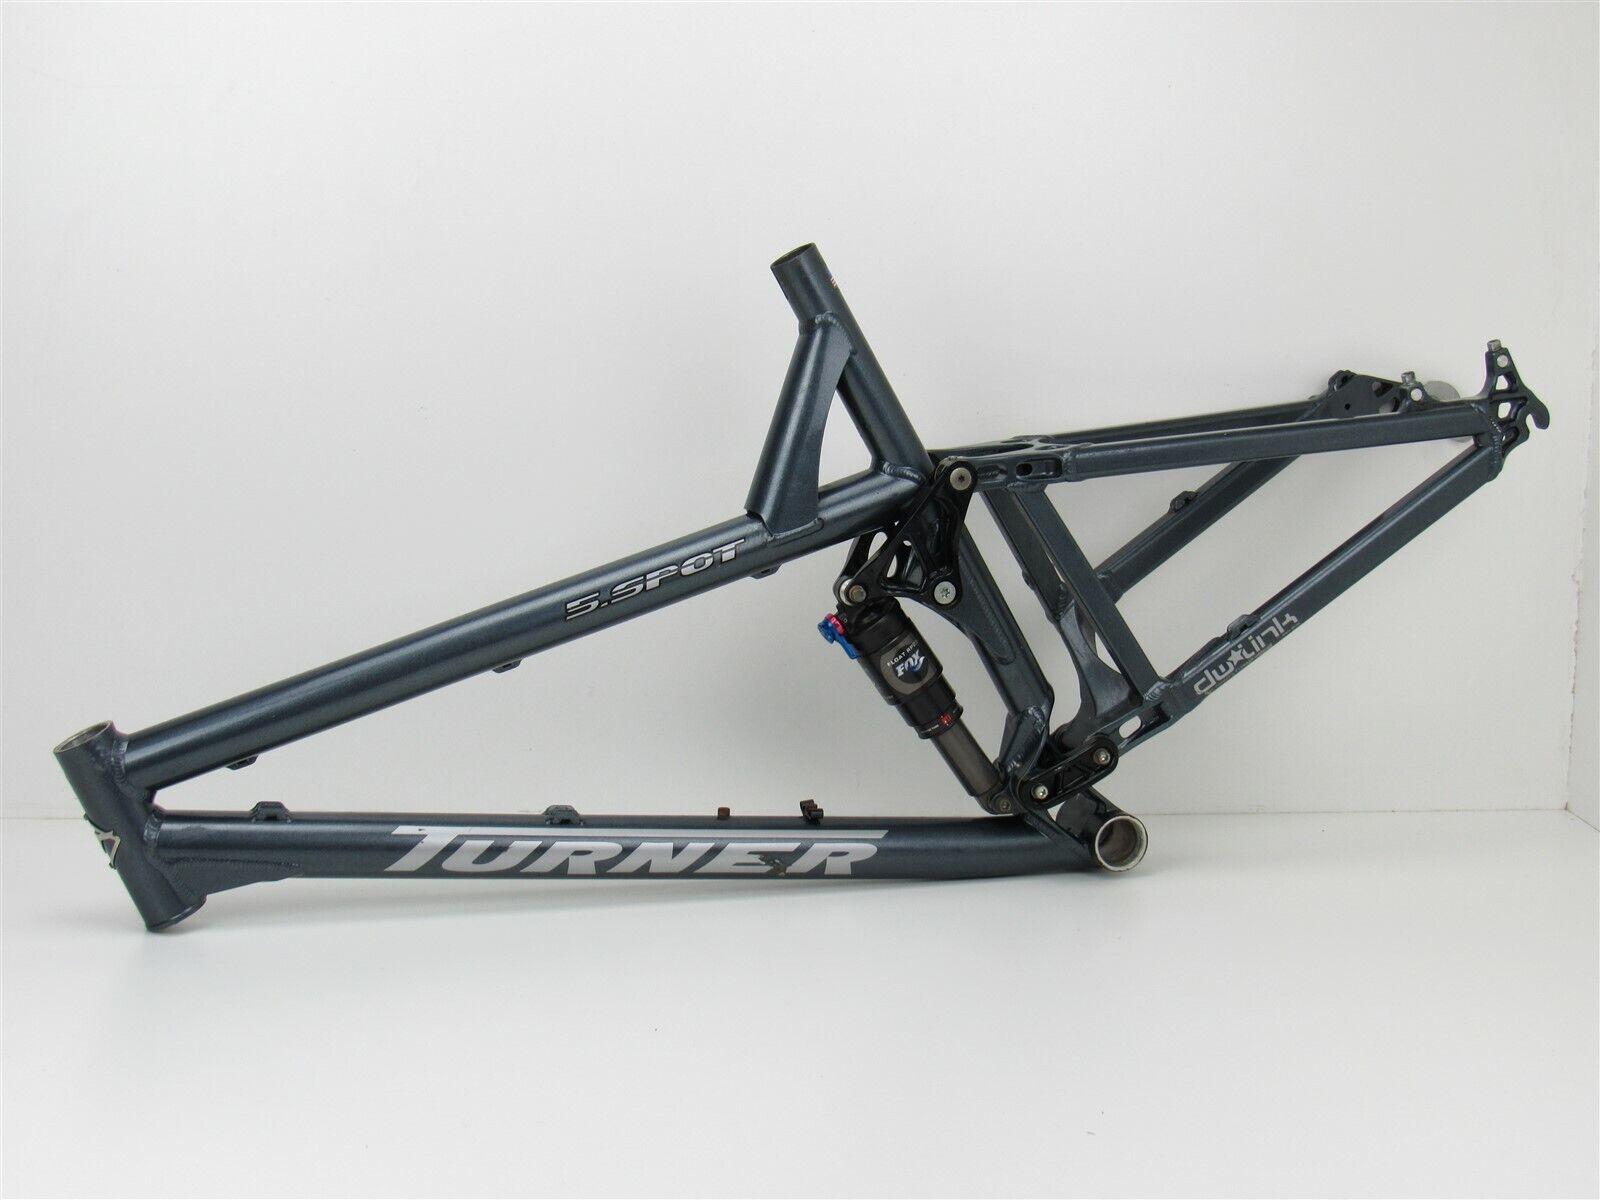 26 Turner 5 Spot sospensione completa telaio mountain bike, gree, 2009